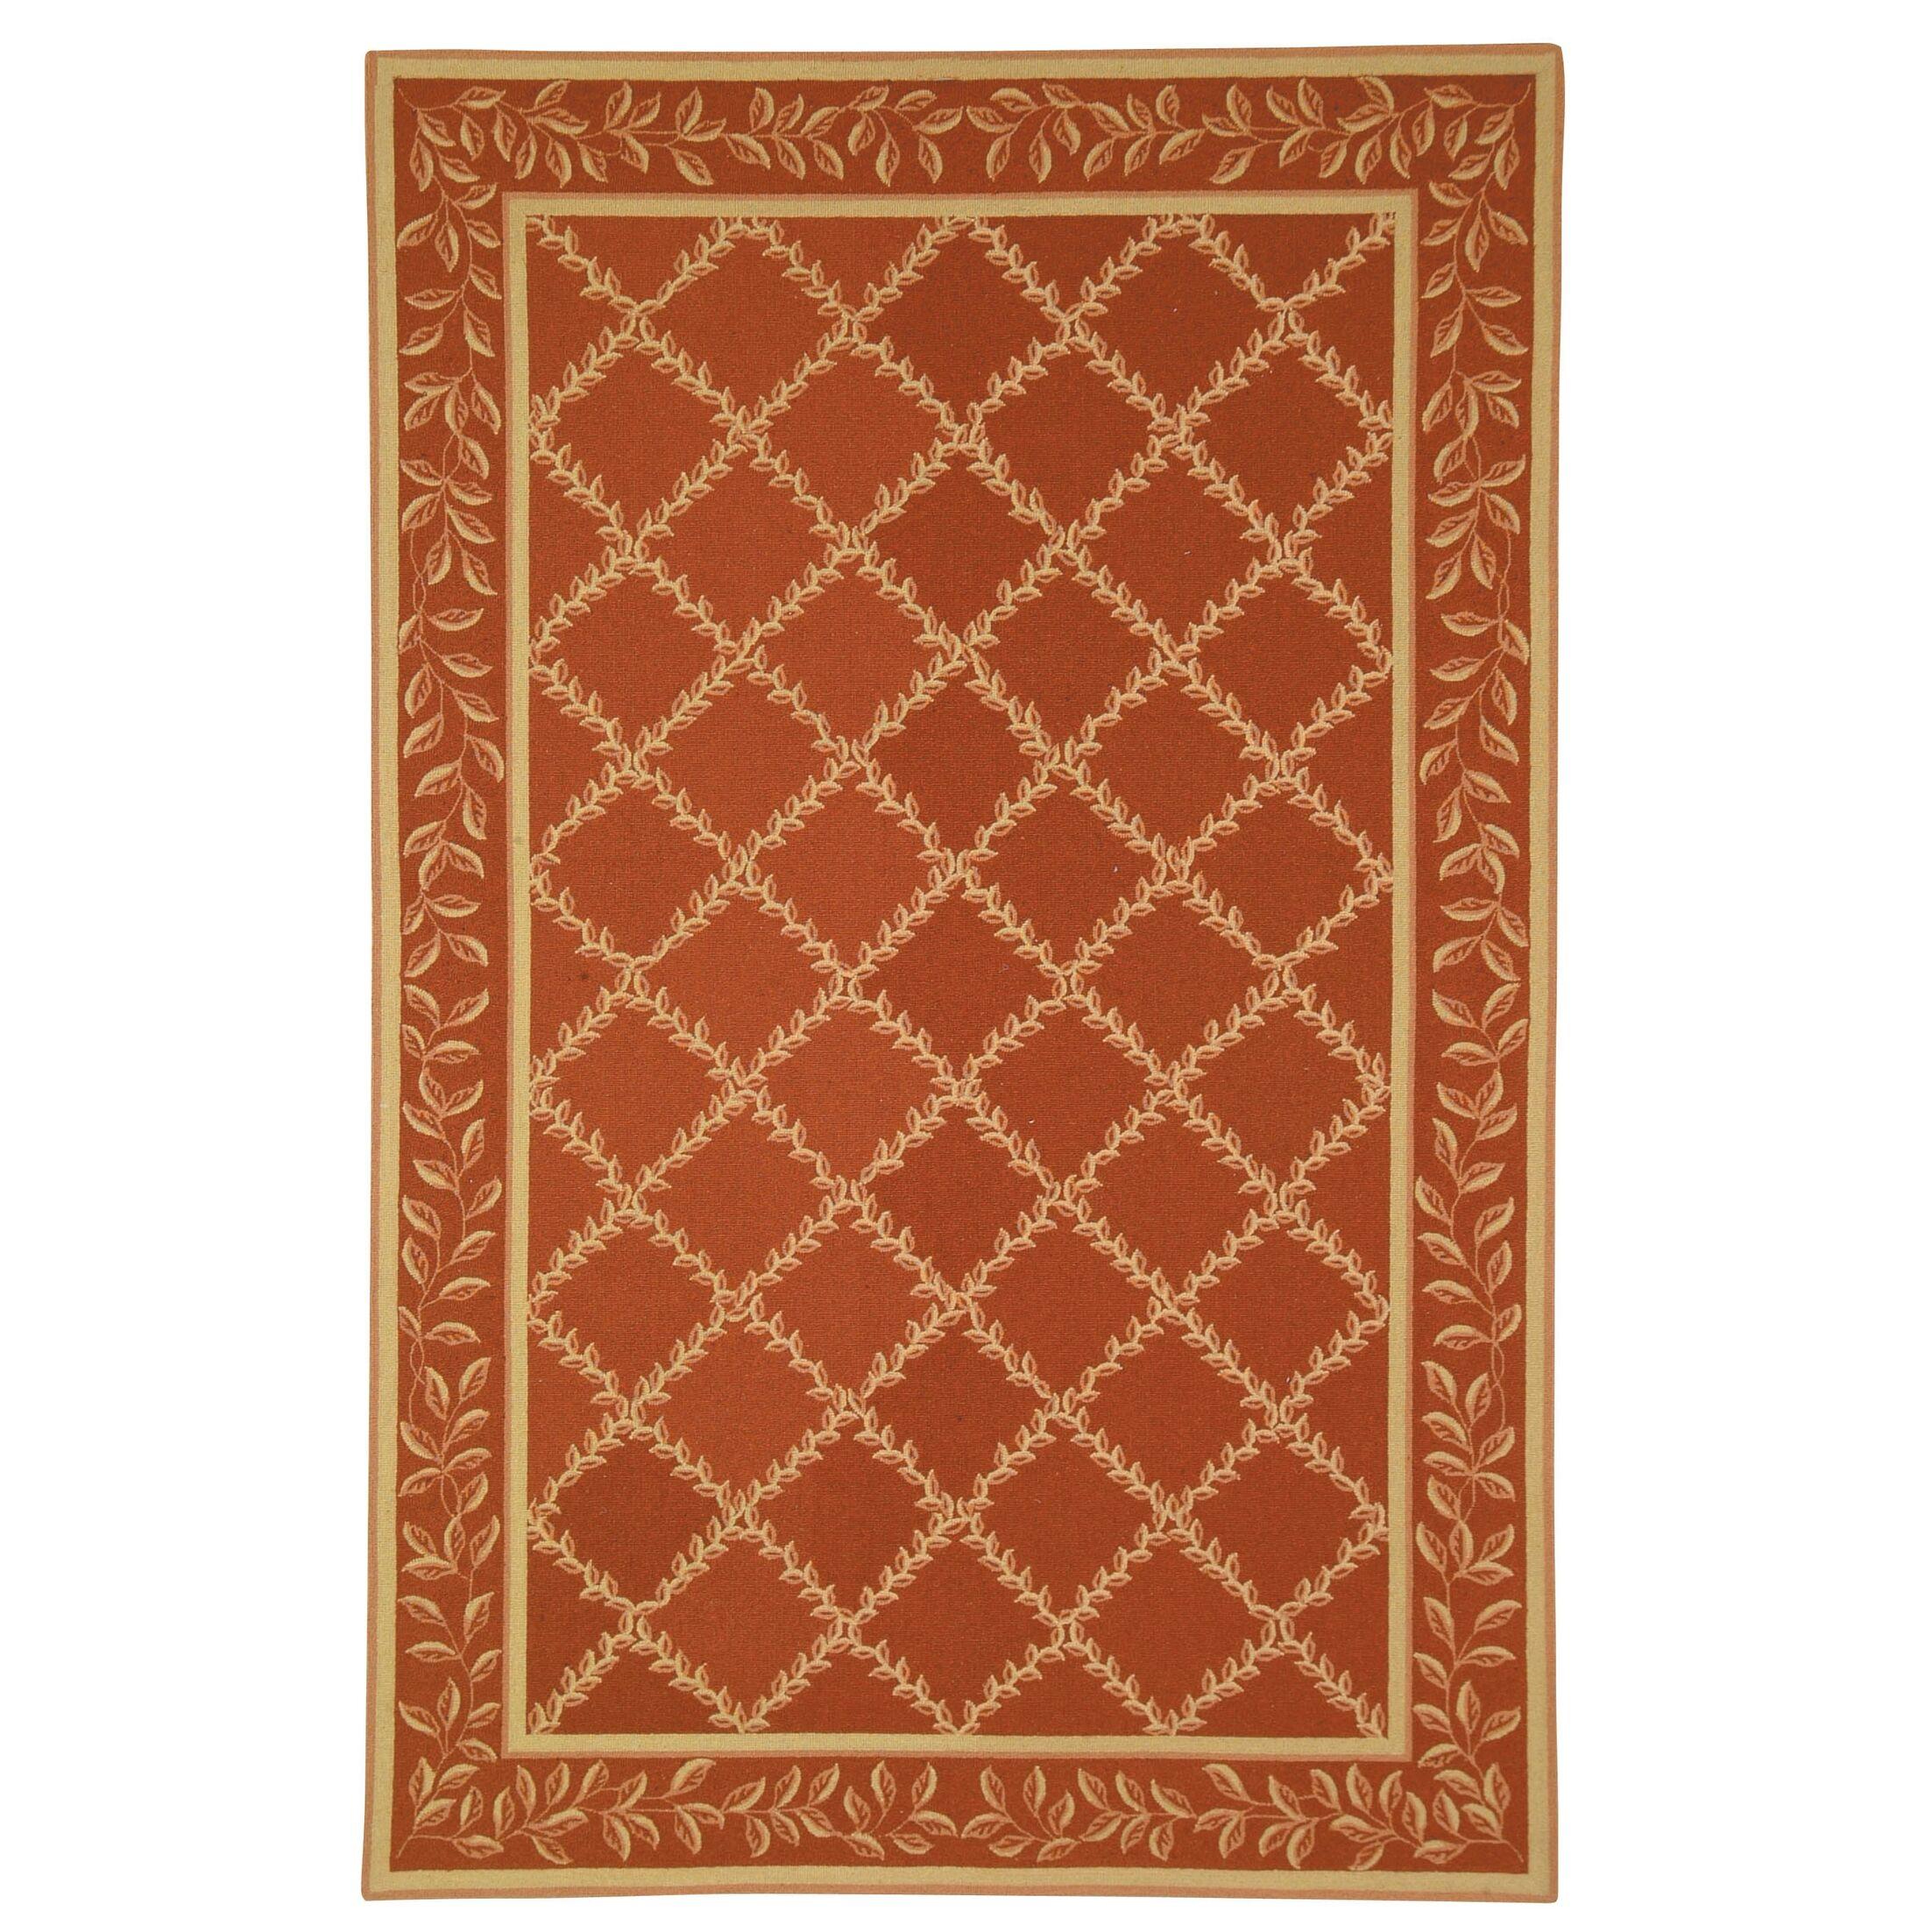 Kinchen Rust/Gold Wilton-Trellis Area Rug Rug Size: Rectangle 5'3